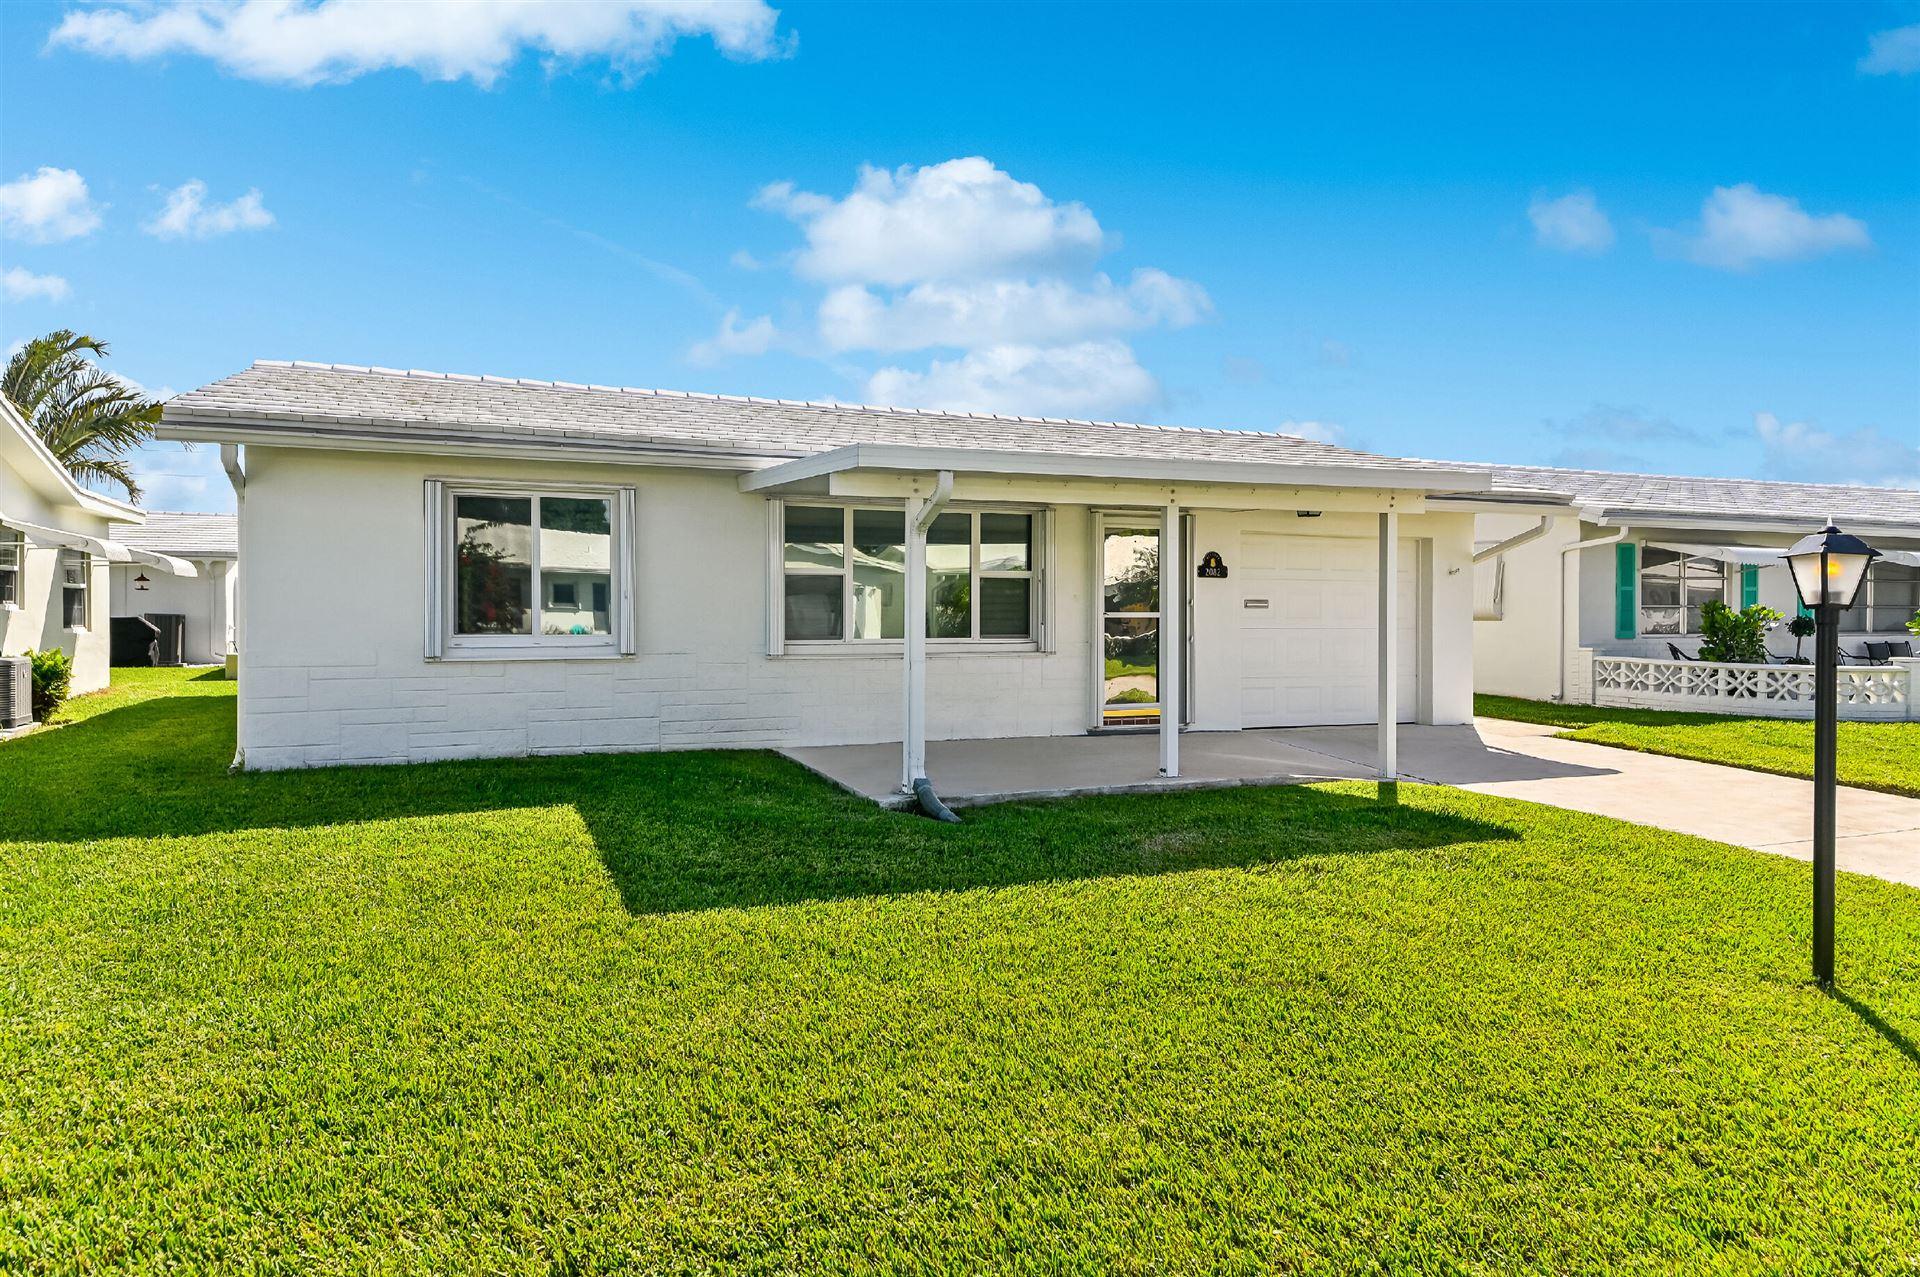 Photo of 2082 SW 13th Ter Terrace, Boynton Beach, FL 33426 (MLS # RX-10753810)